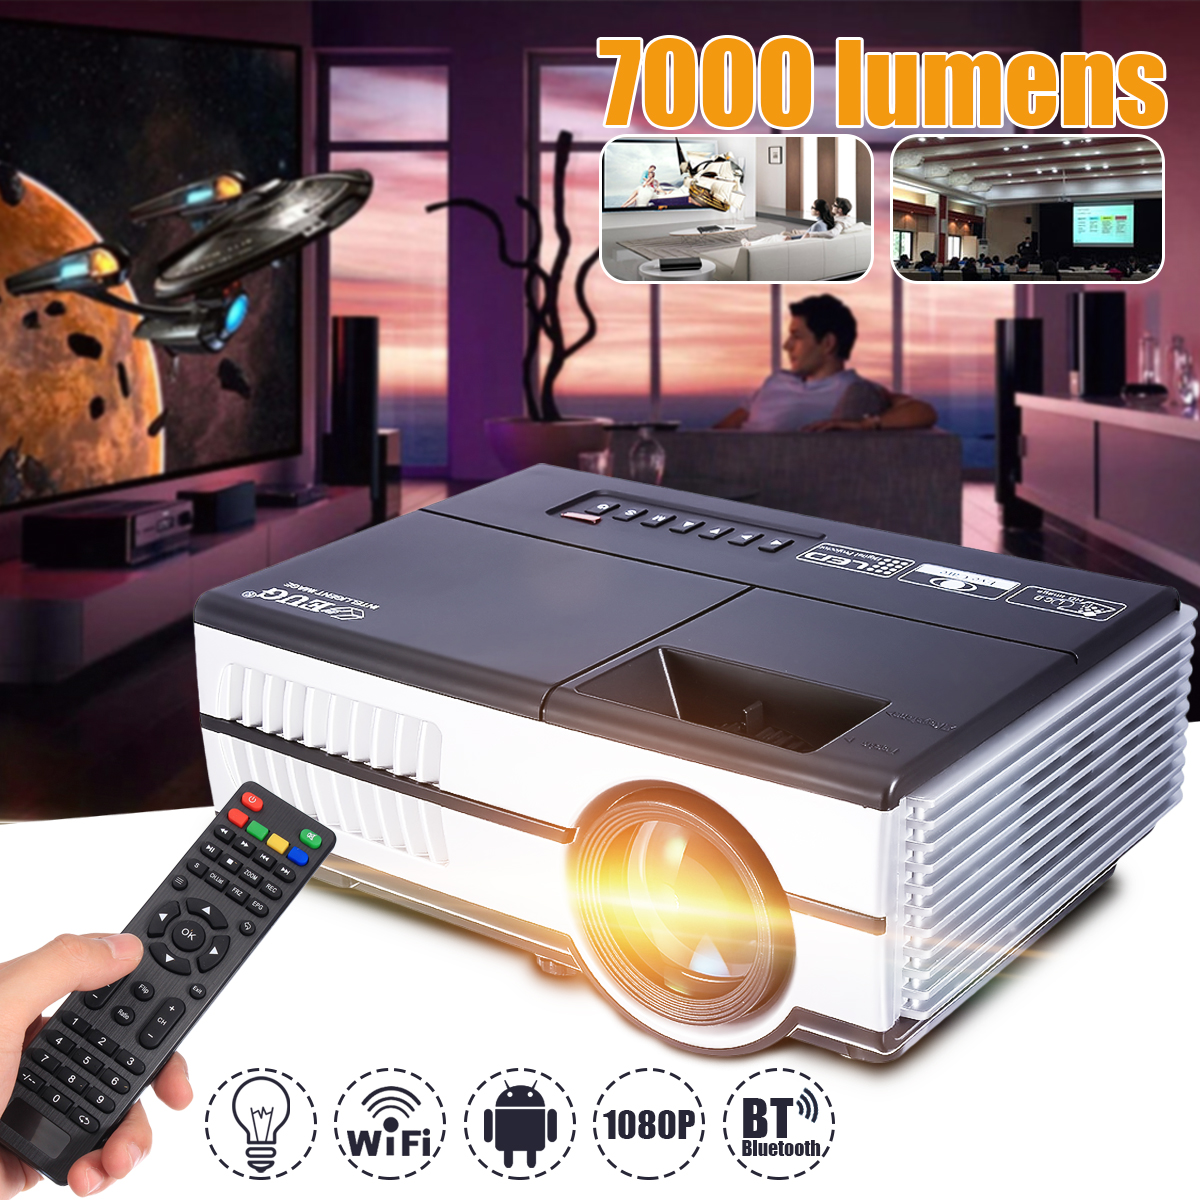 Max 7000Lumens 1080P Full HD LED Projector 3D Home Theater Cinema LCD Wireless HDMI AV/VGA/USB/SD/HDMI/TV Multimedia Beamer 1080p hd home cinema theater multimedia led projector av vga usb hdmi futural digital jull13